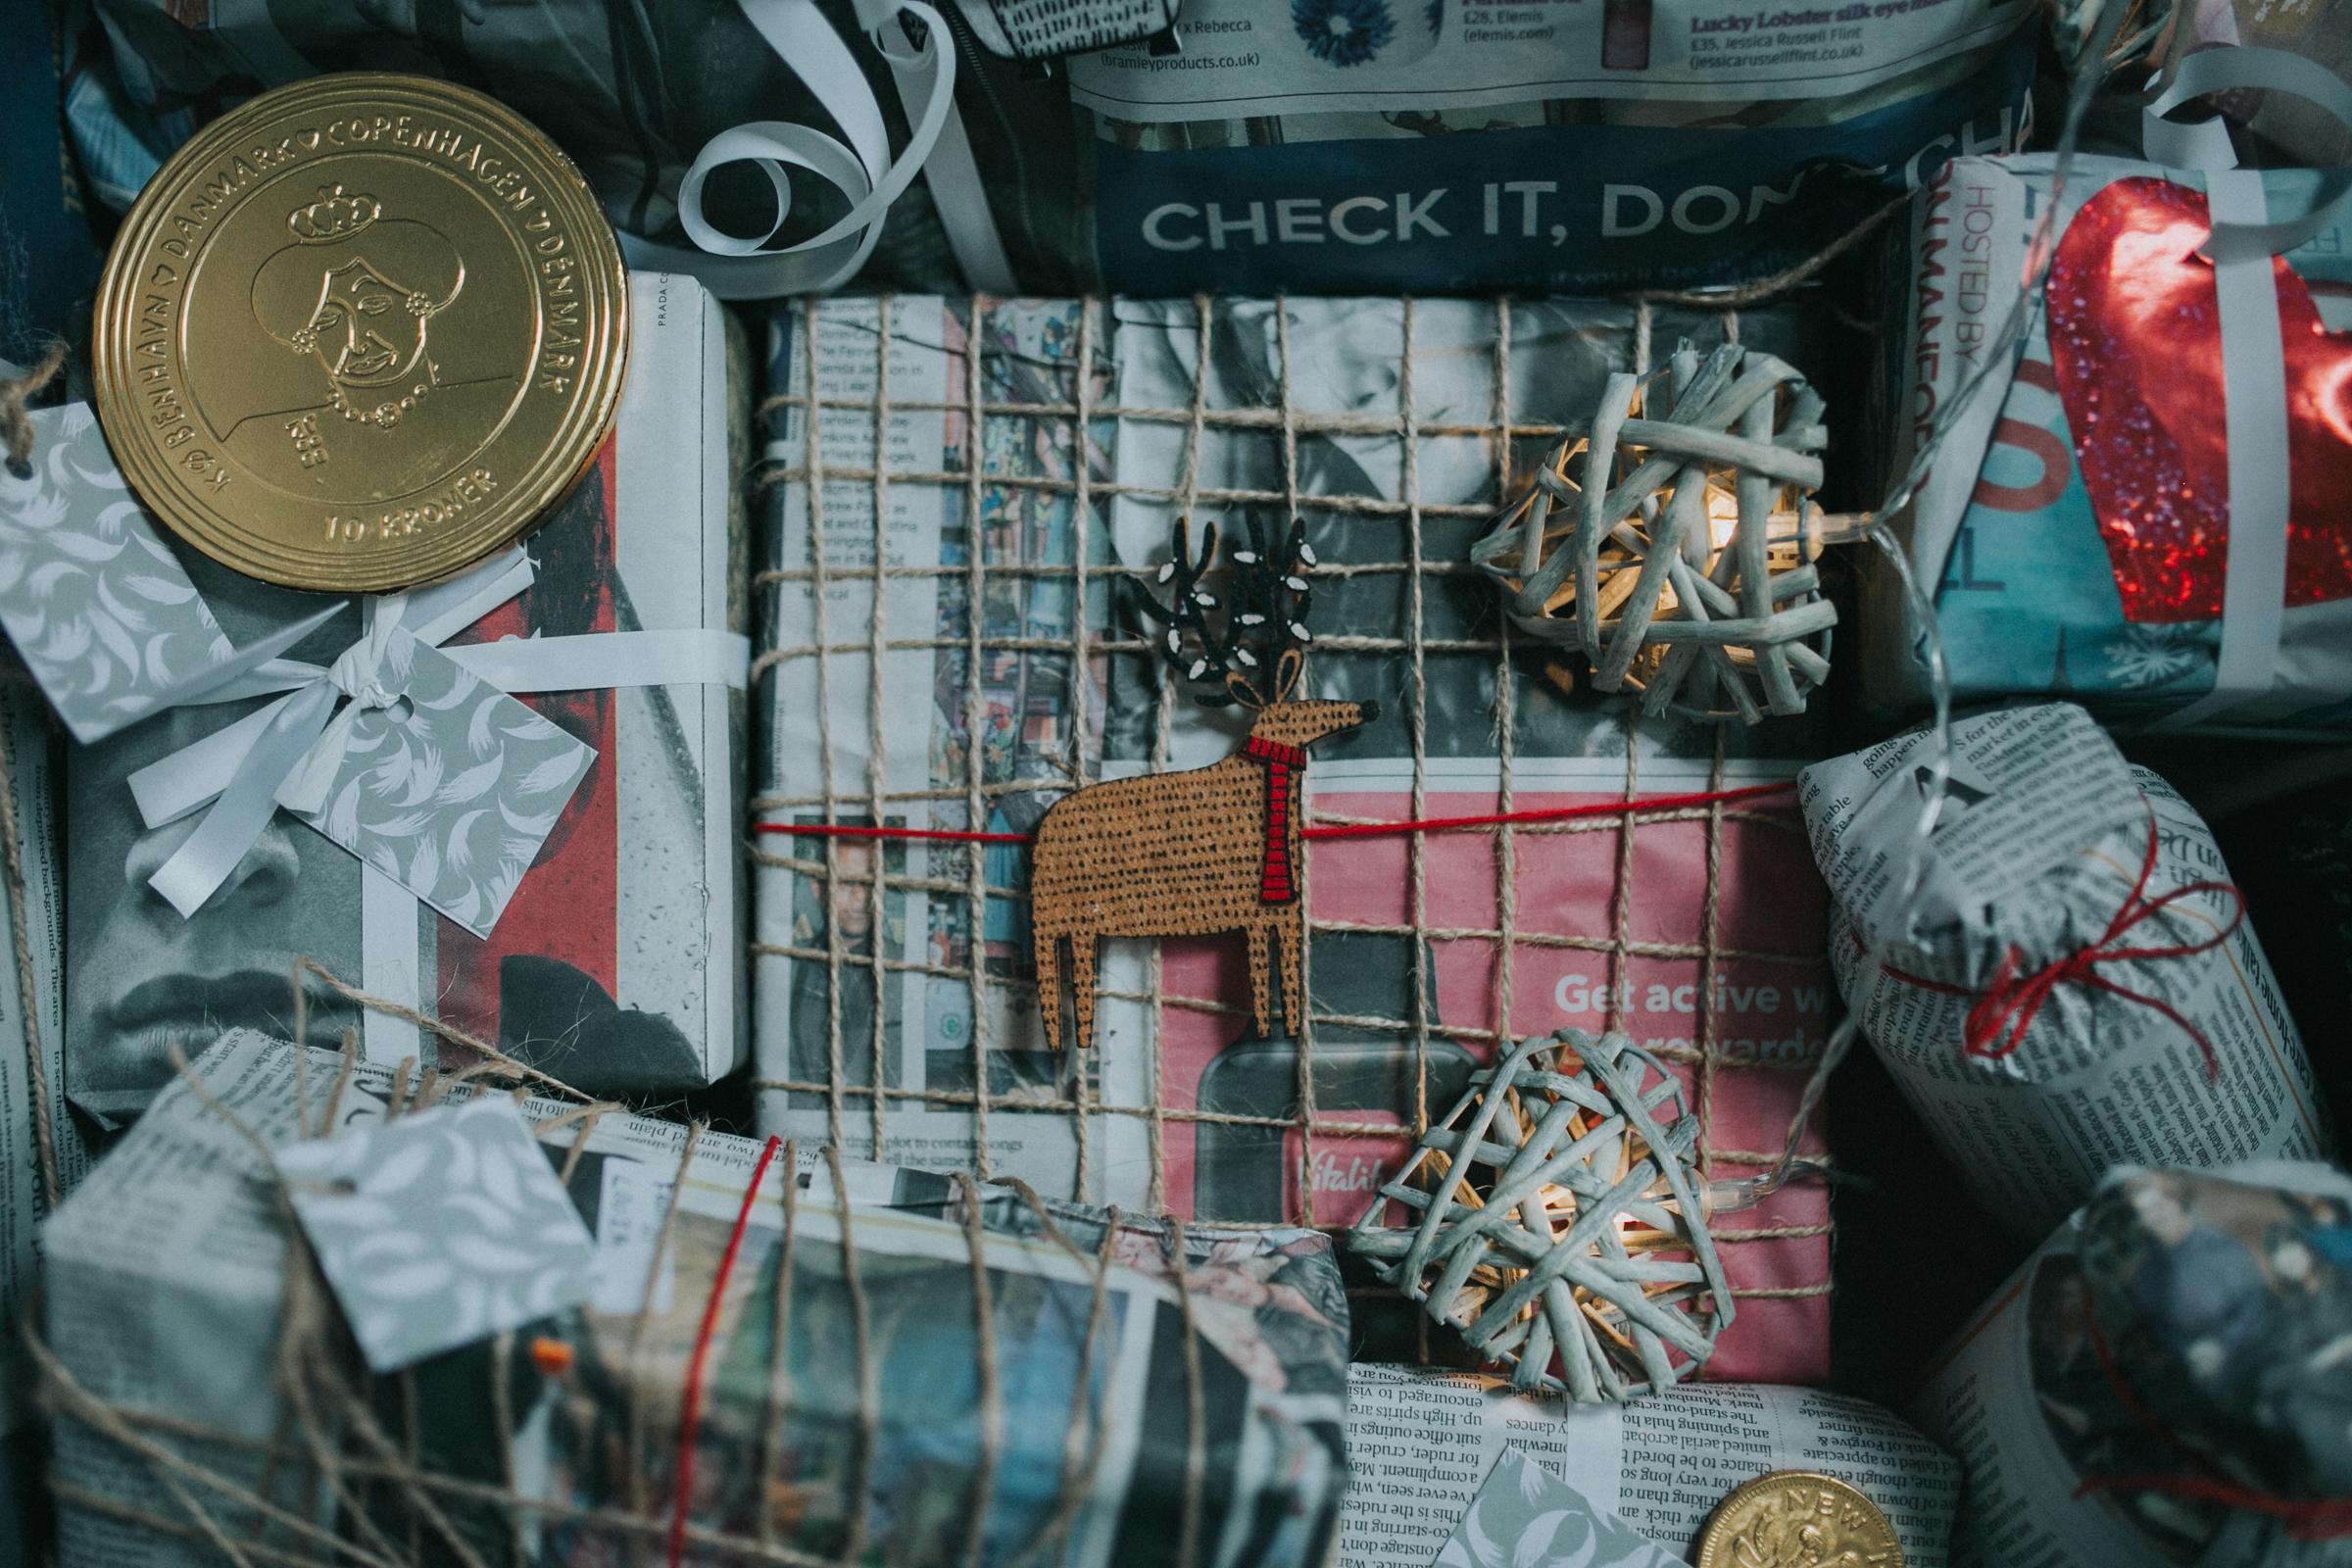 Christmas-gift-wrapping-ideas-minas-planet-minasplanet-how-to-wrap-christmas-presents-diy7.jpg